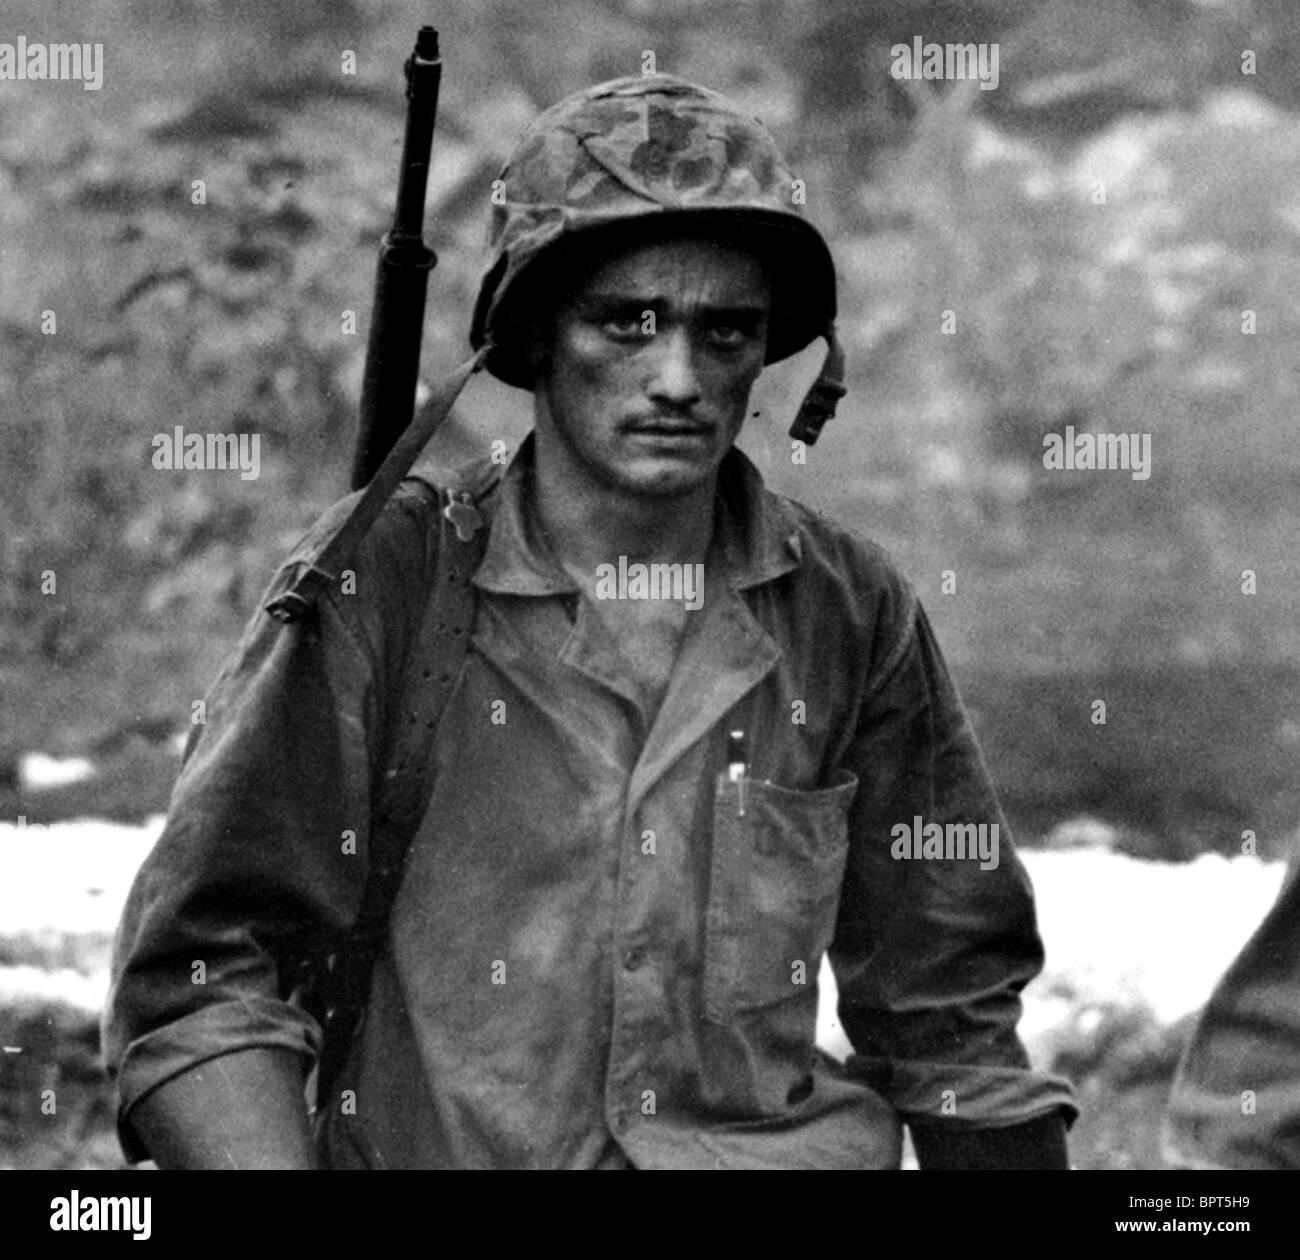 SECOND WORLD WAR SOLDIER THE WAR ; THE WAR (2007) - Stock Image